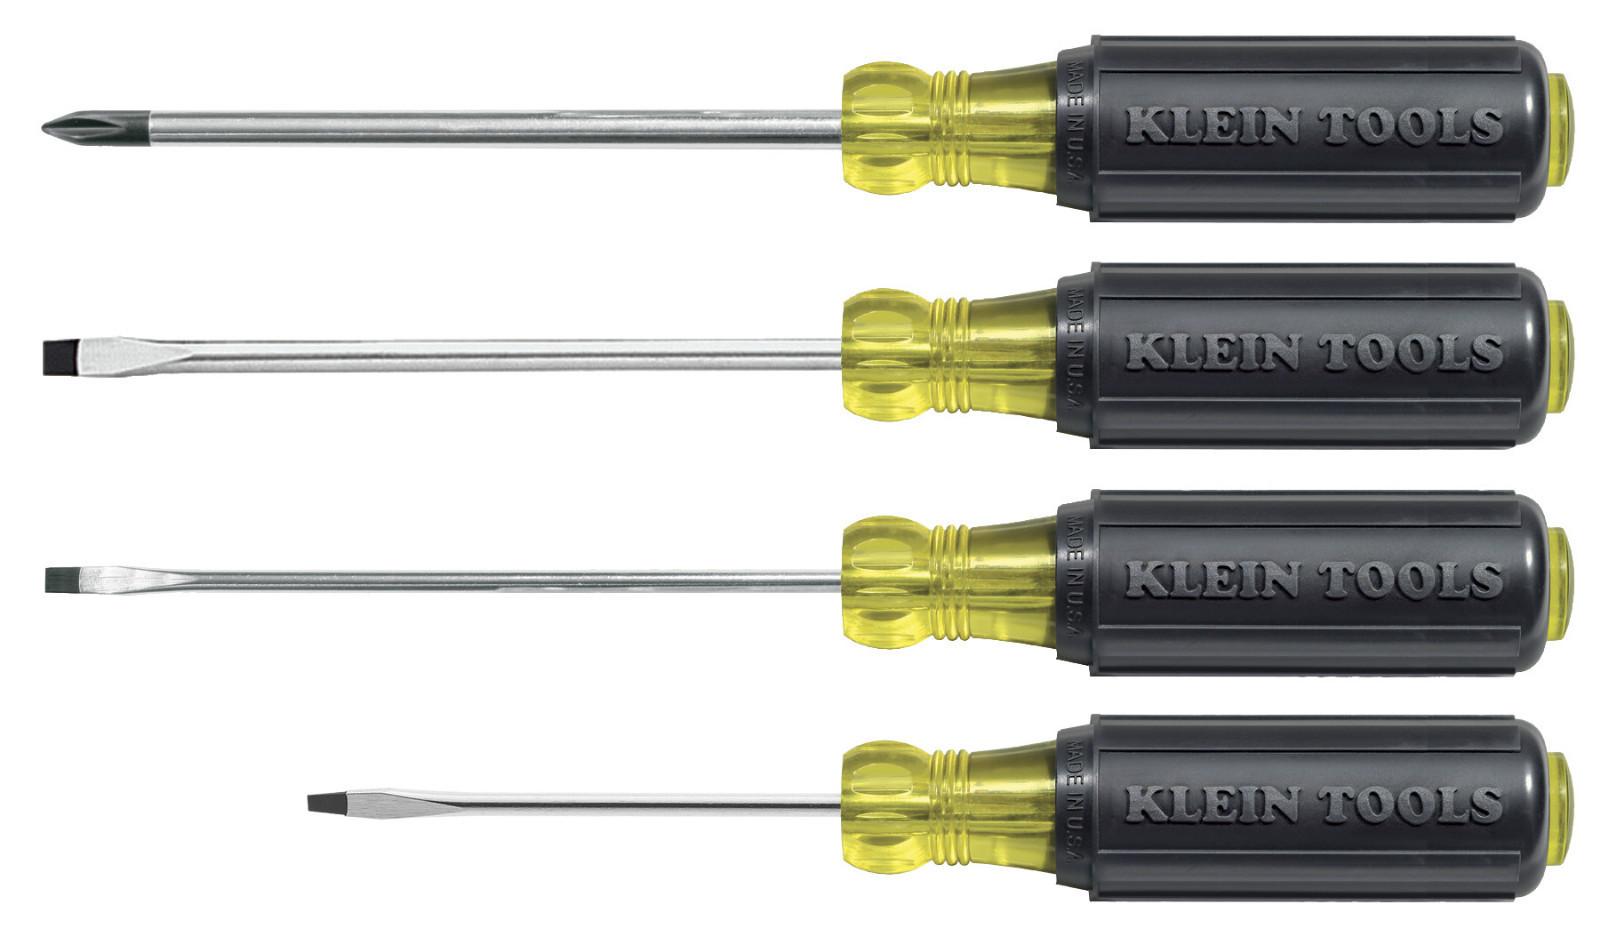 klein tools 85484 four 4 piece mini cushion grip screwdriver set ebay. Black Bedroom Furniture Sets. Home Design Ideas